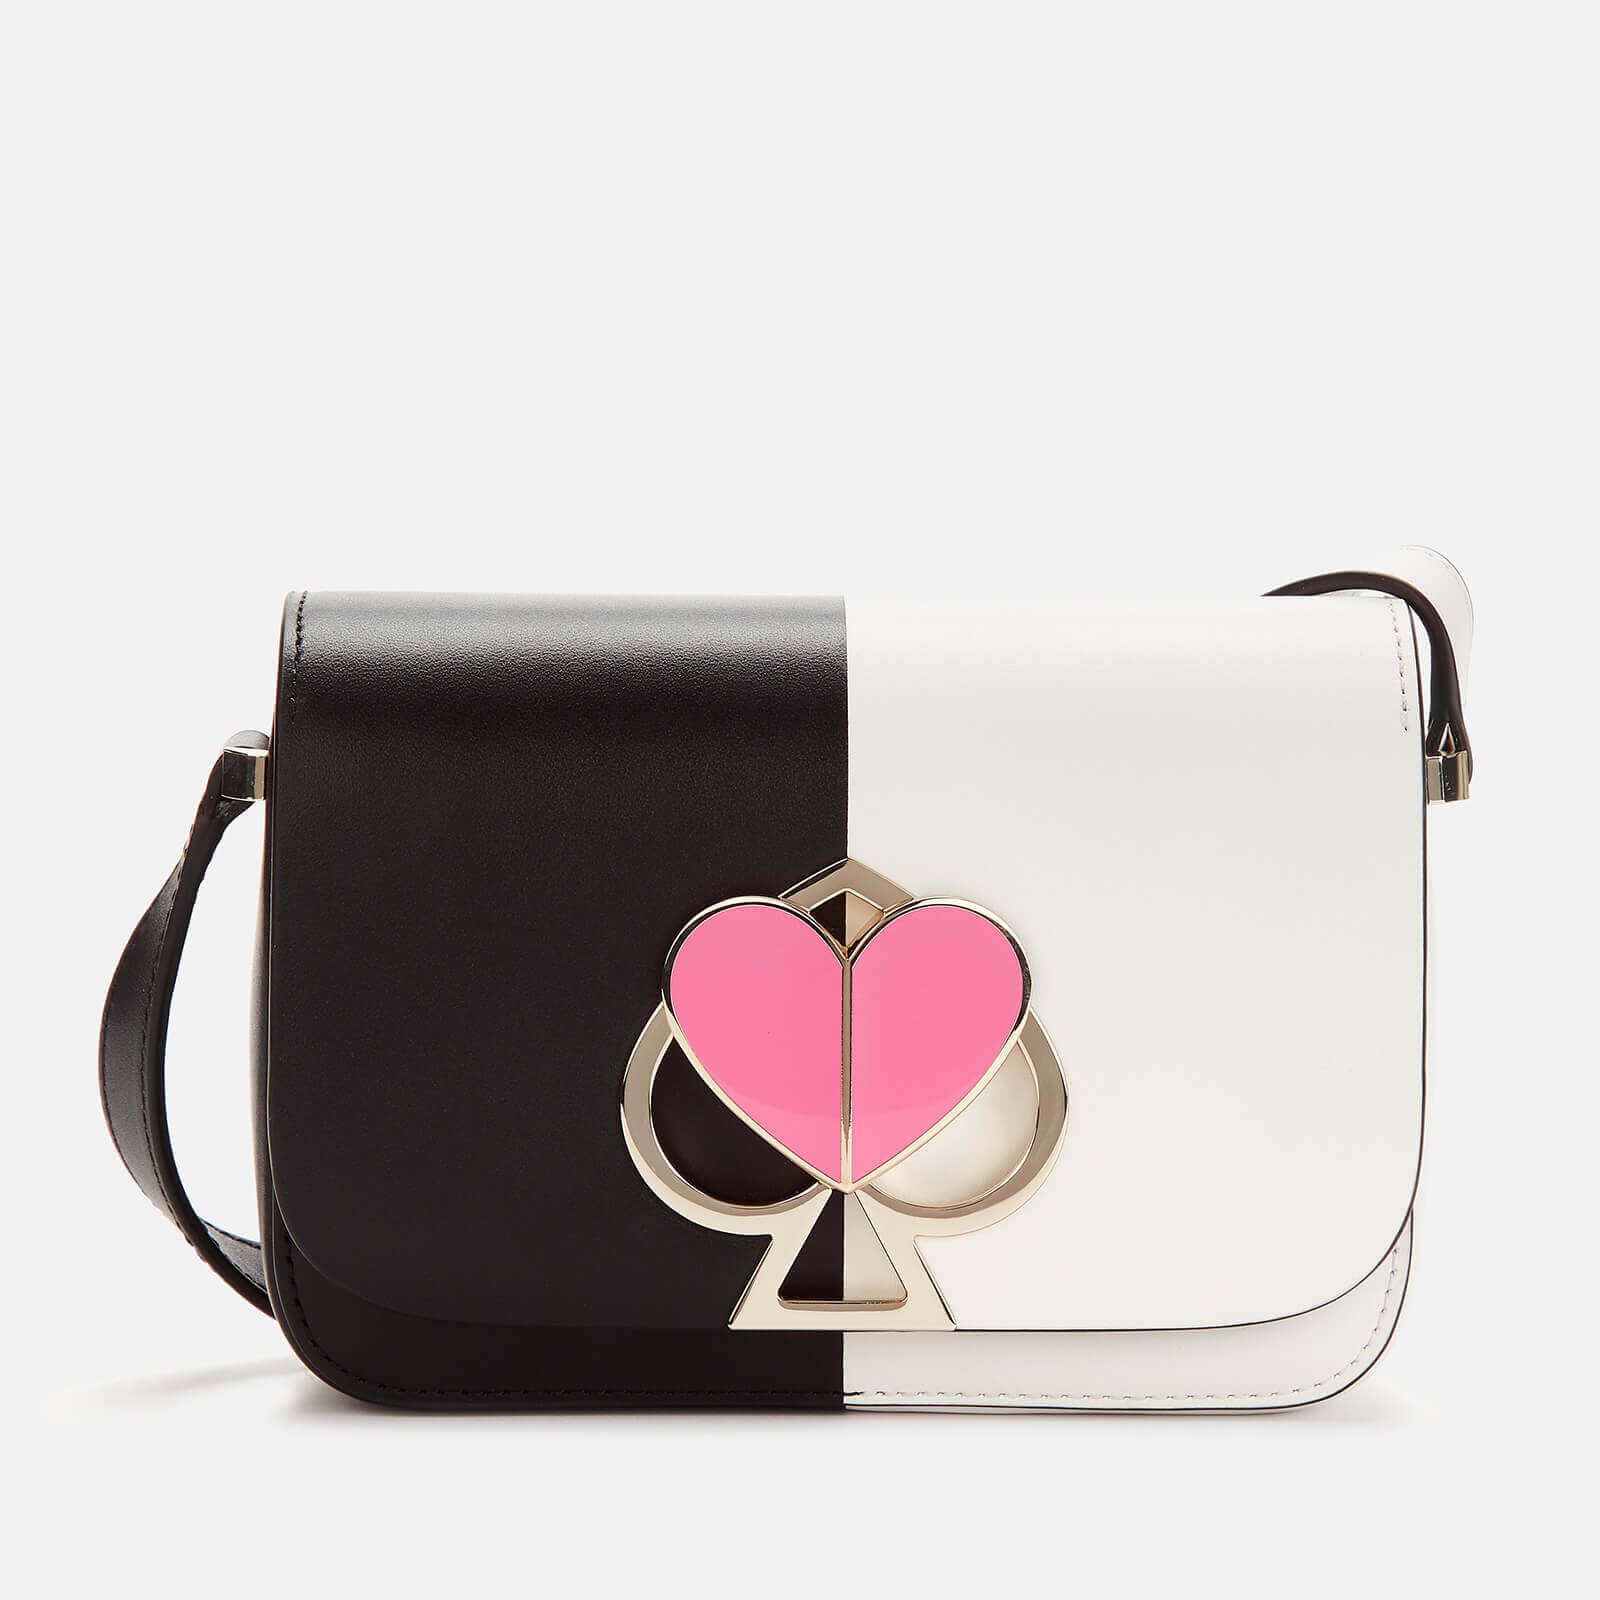 Kate Spade New York Nicola Twistlock Shoulder Bag